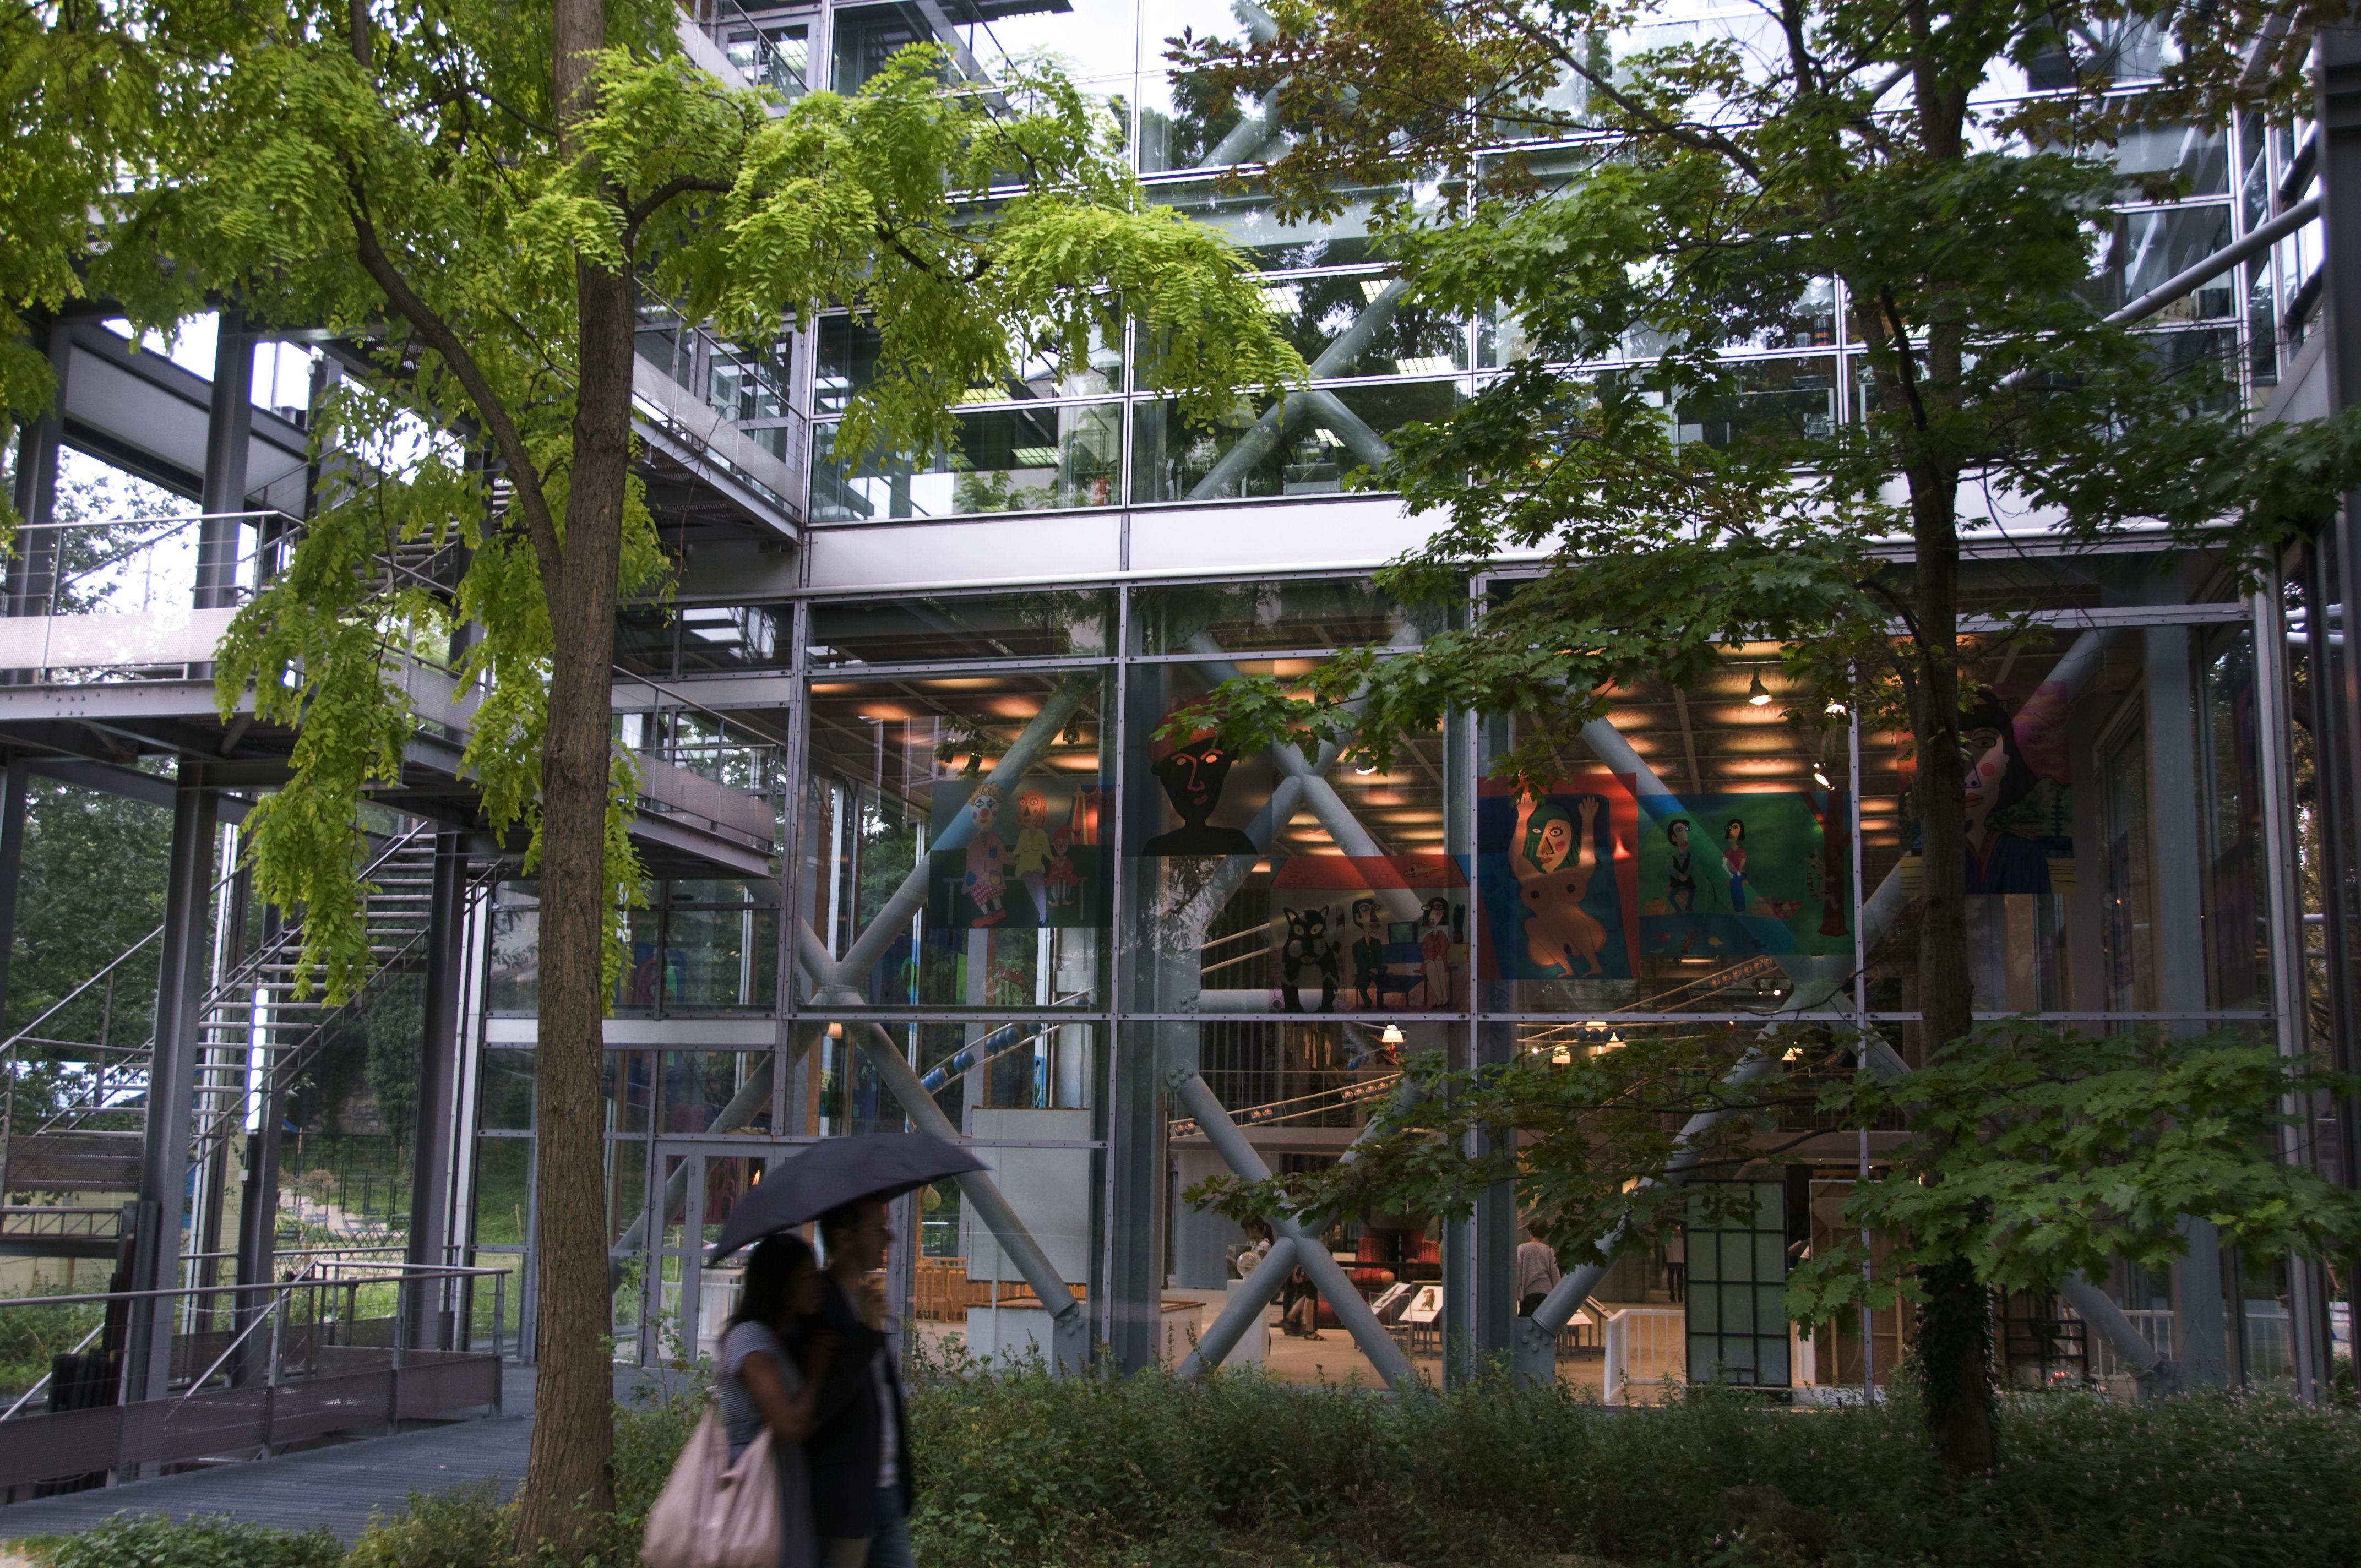 Fondation Cartier in Paris.